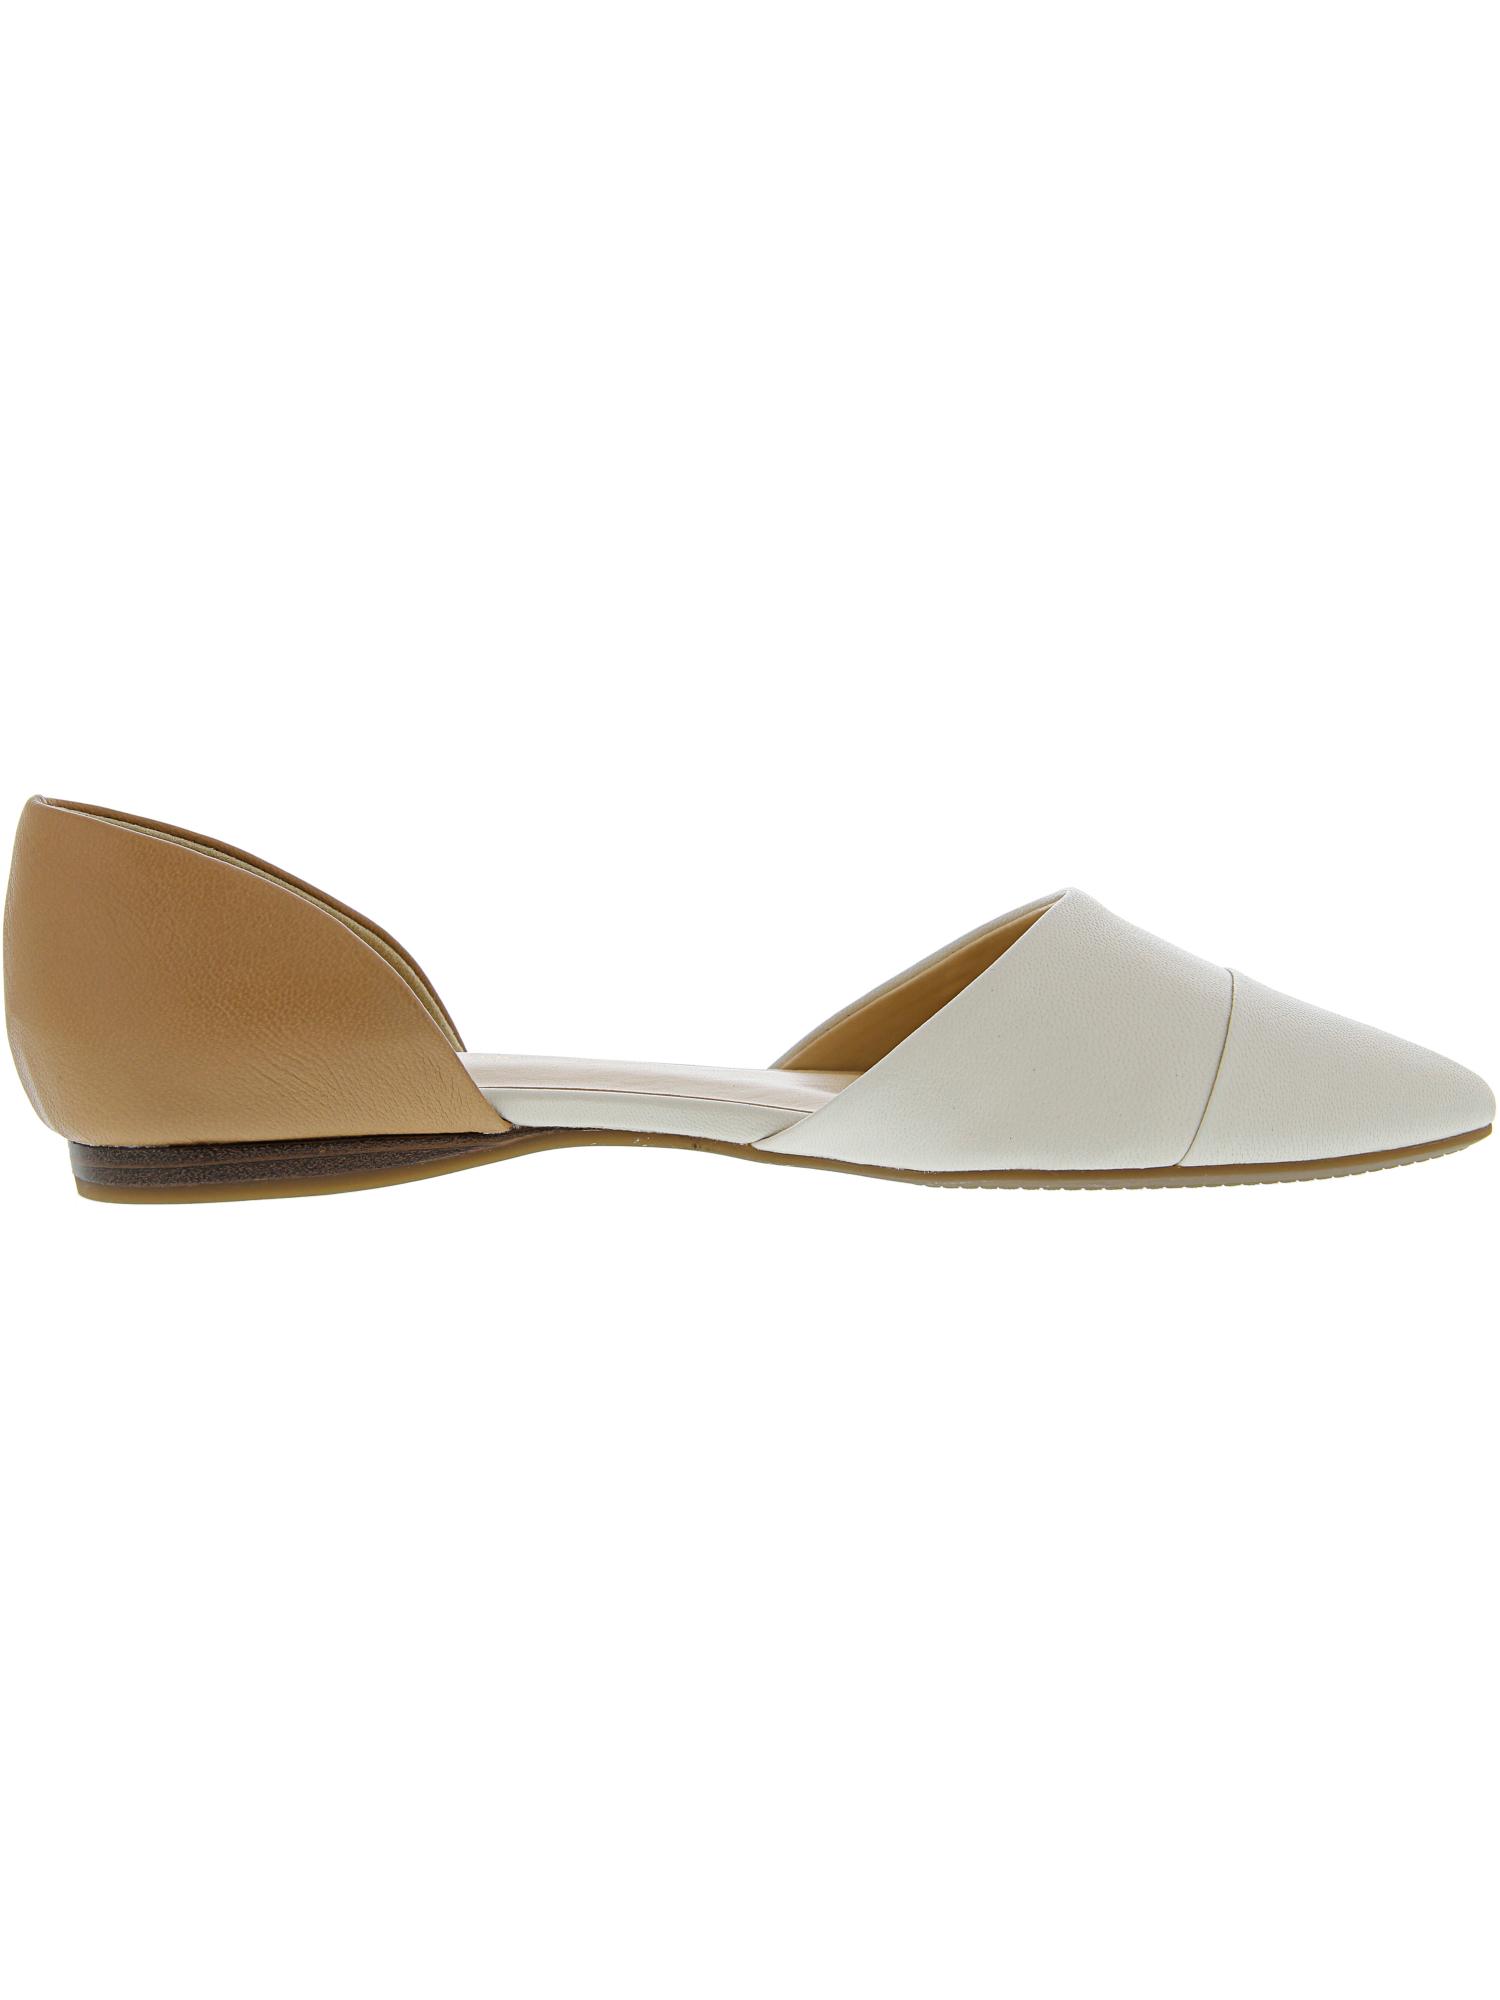 fb97644e14343 Tommy Hilfiger Women s Naree3 Leather Flat Shoe